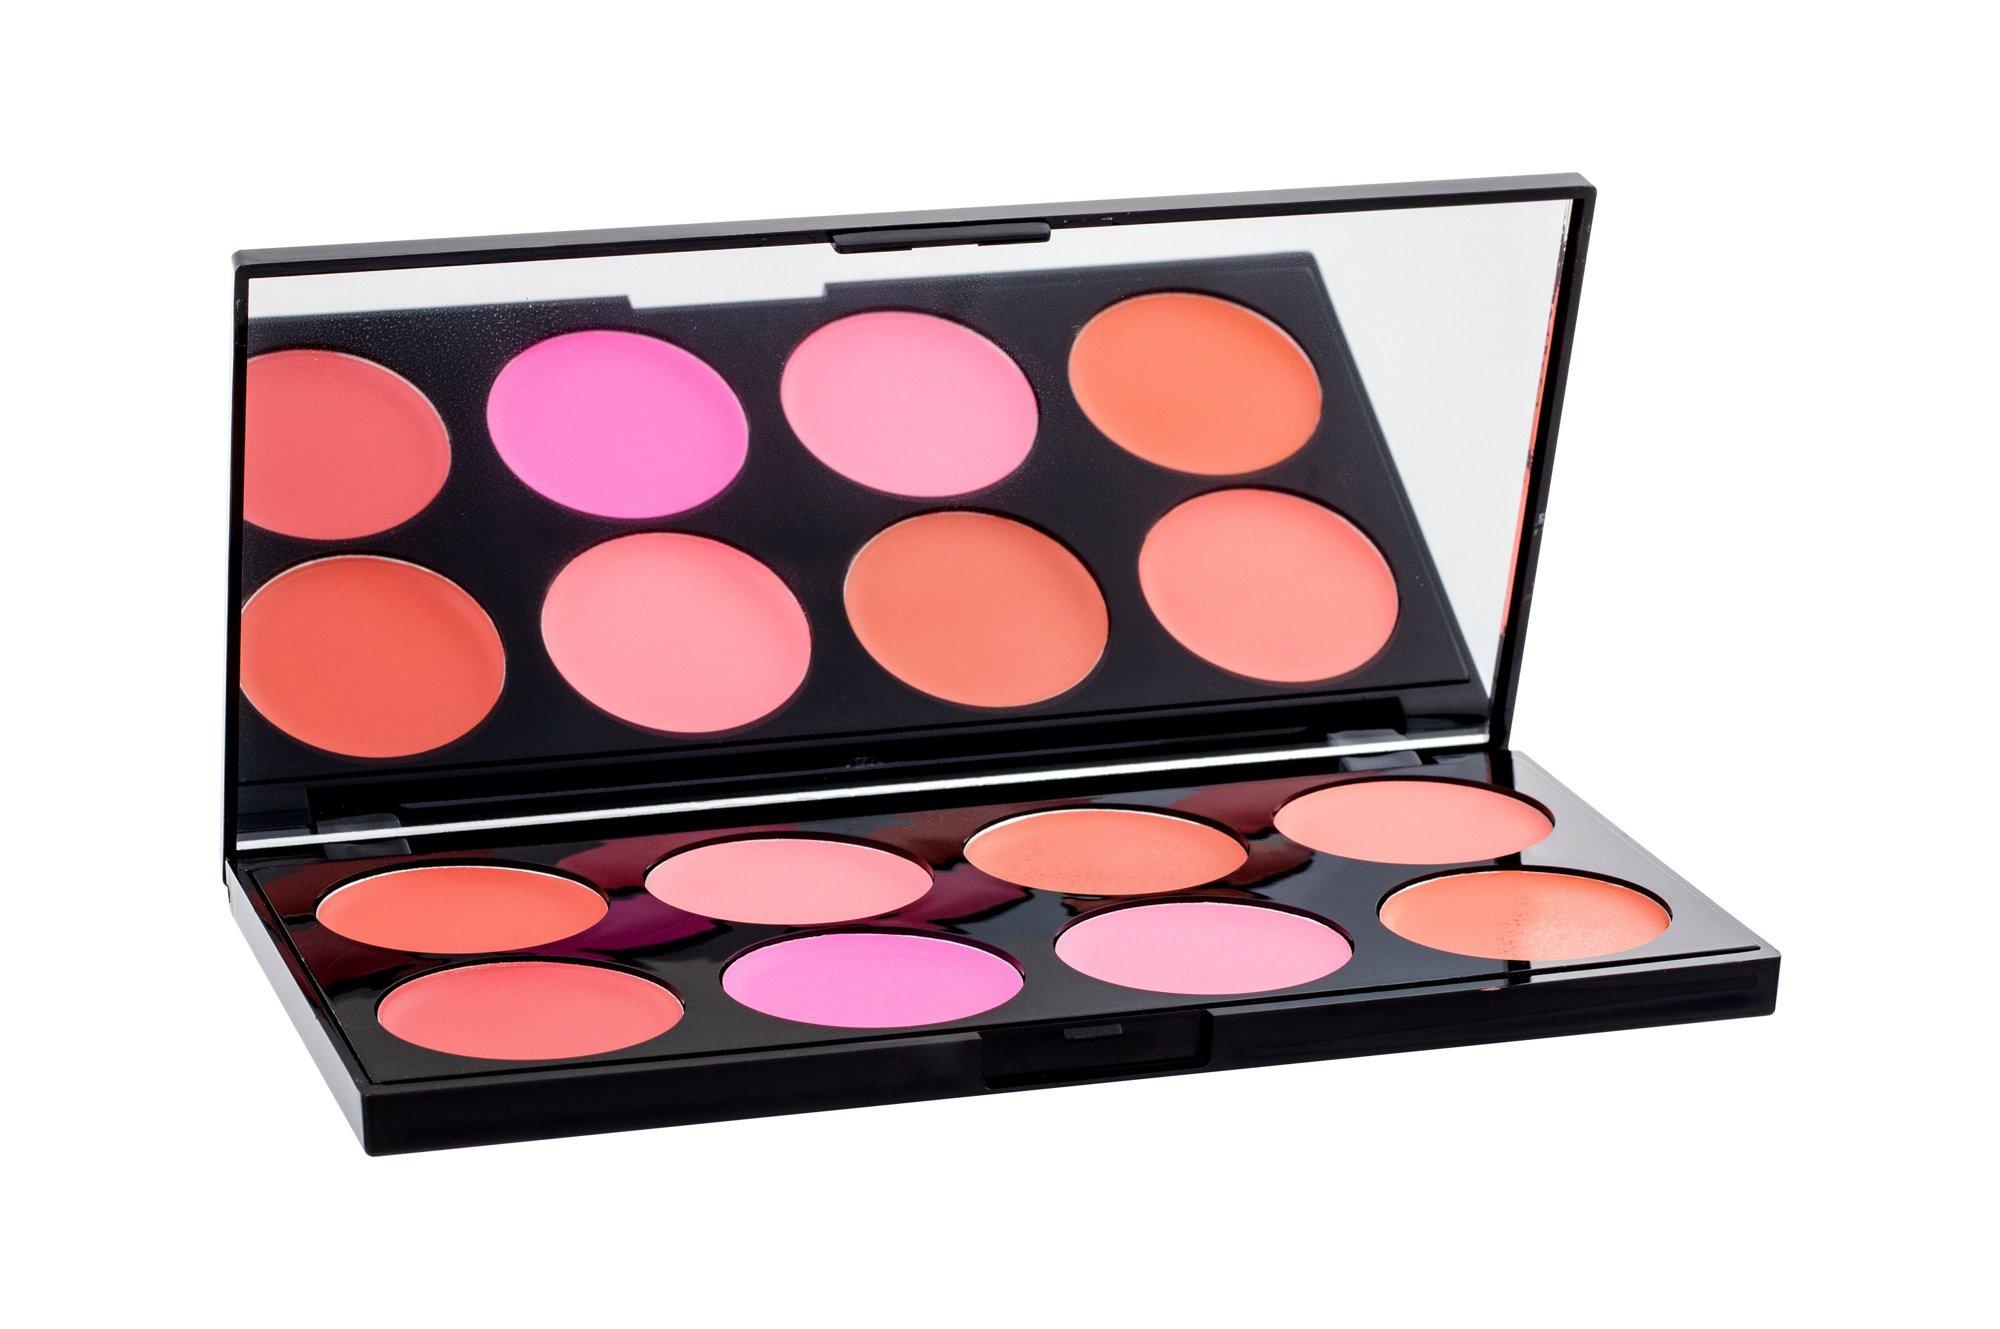 Makeup Revolution London Ultra Blush Palette Blush 13ml All About Cream